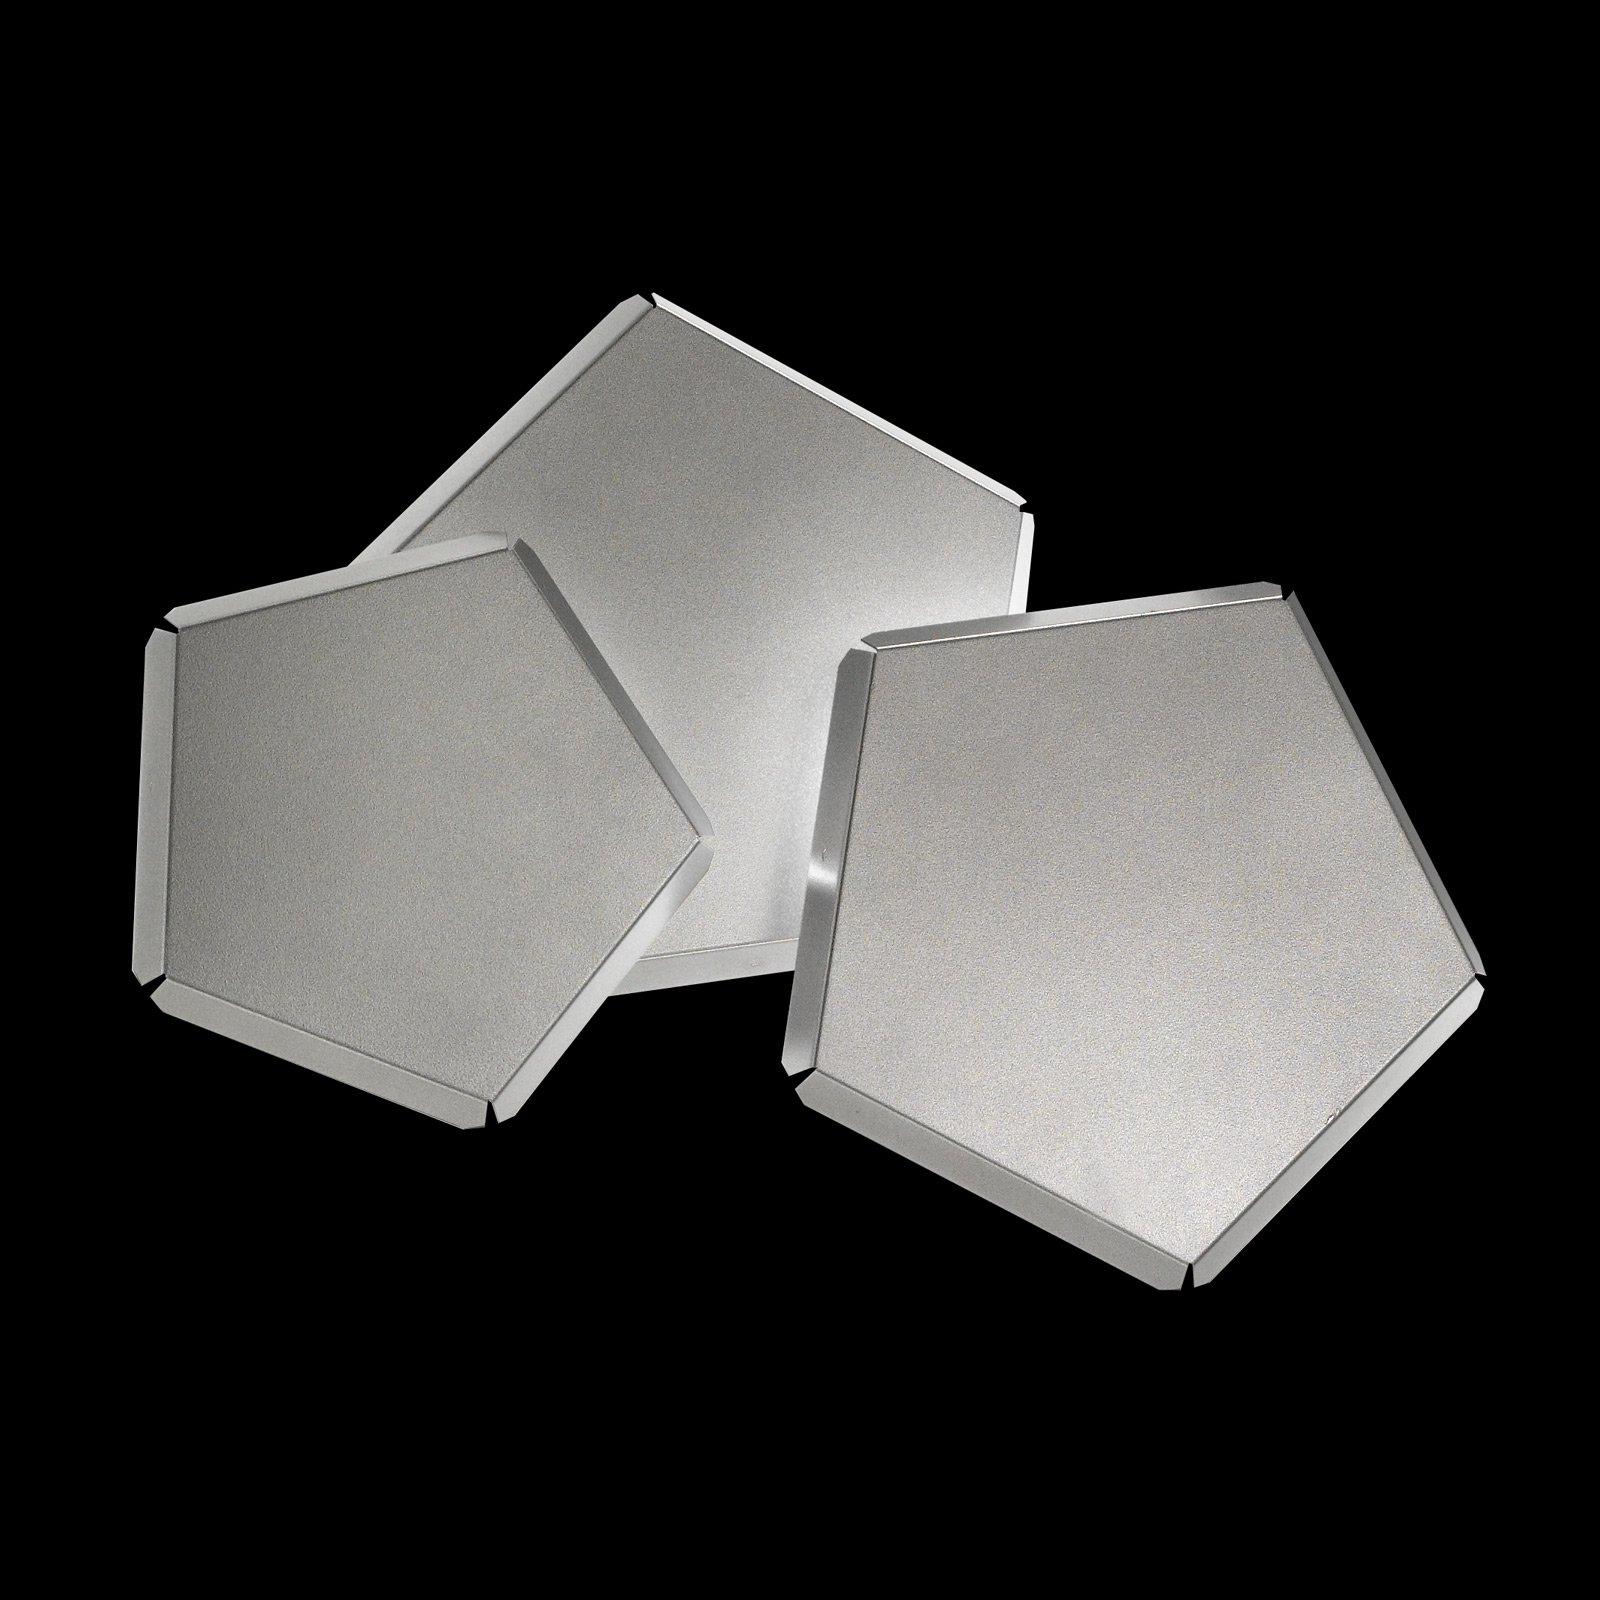 LED-vegglampe Pleiadi i sølv, 3 lyskilder